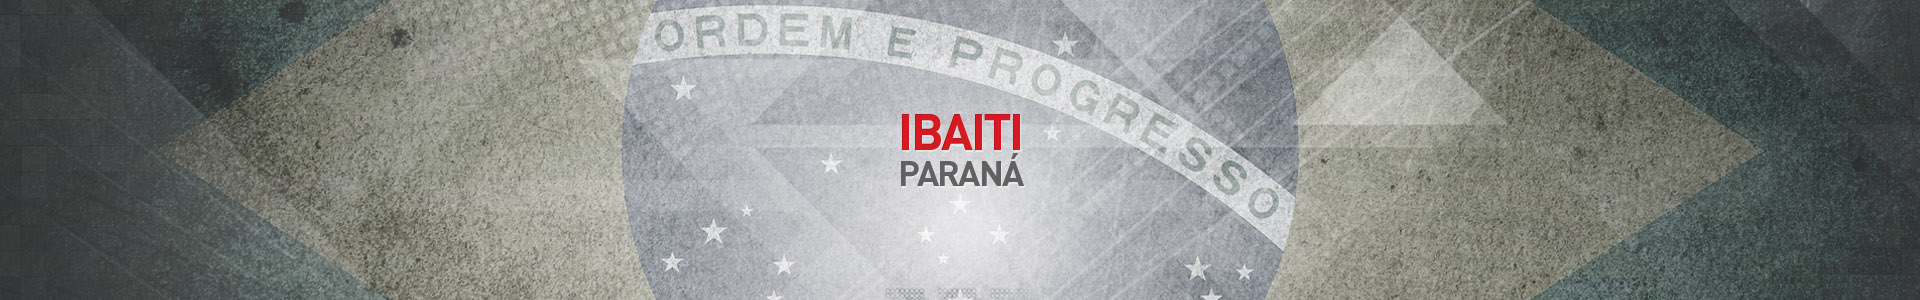 Topo-Cidades-Ibaiti-SBA